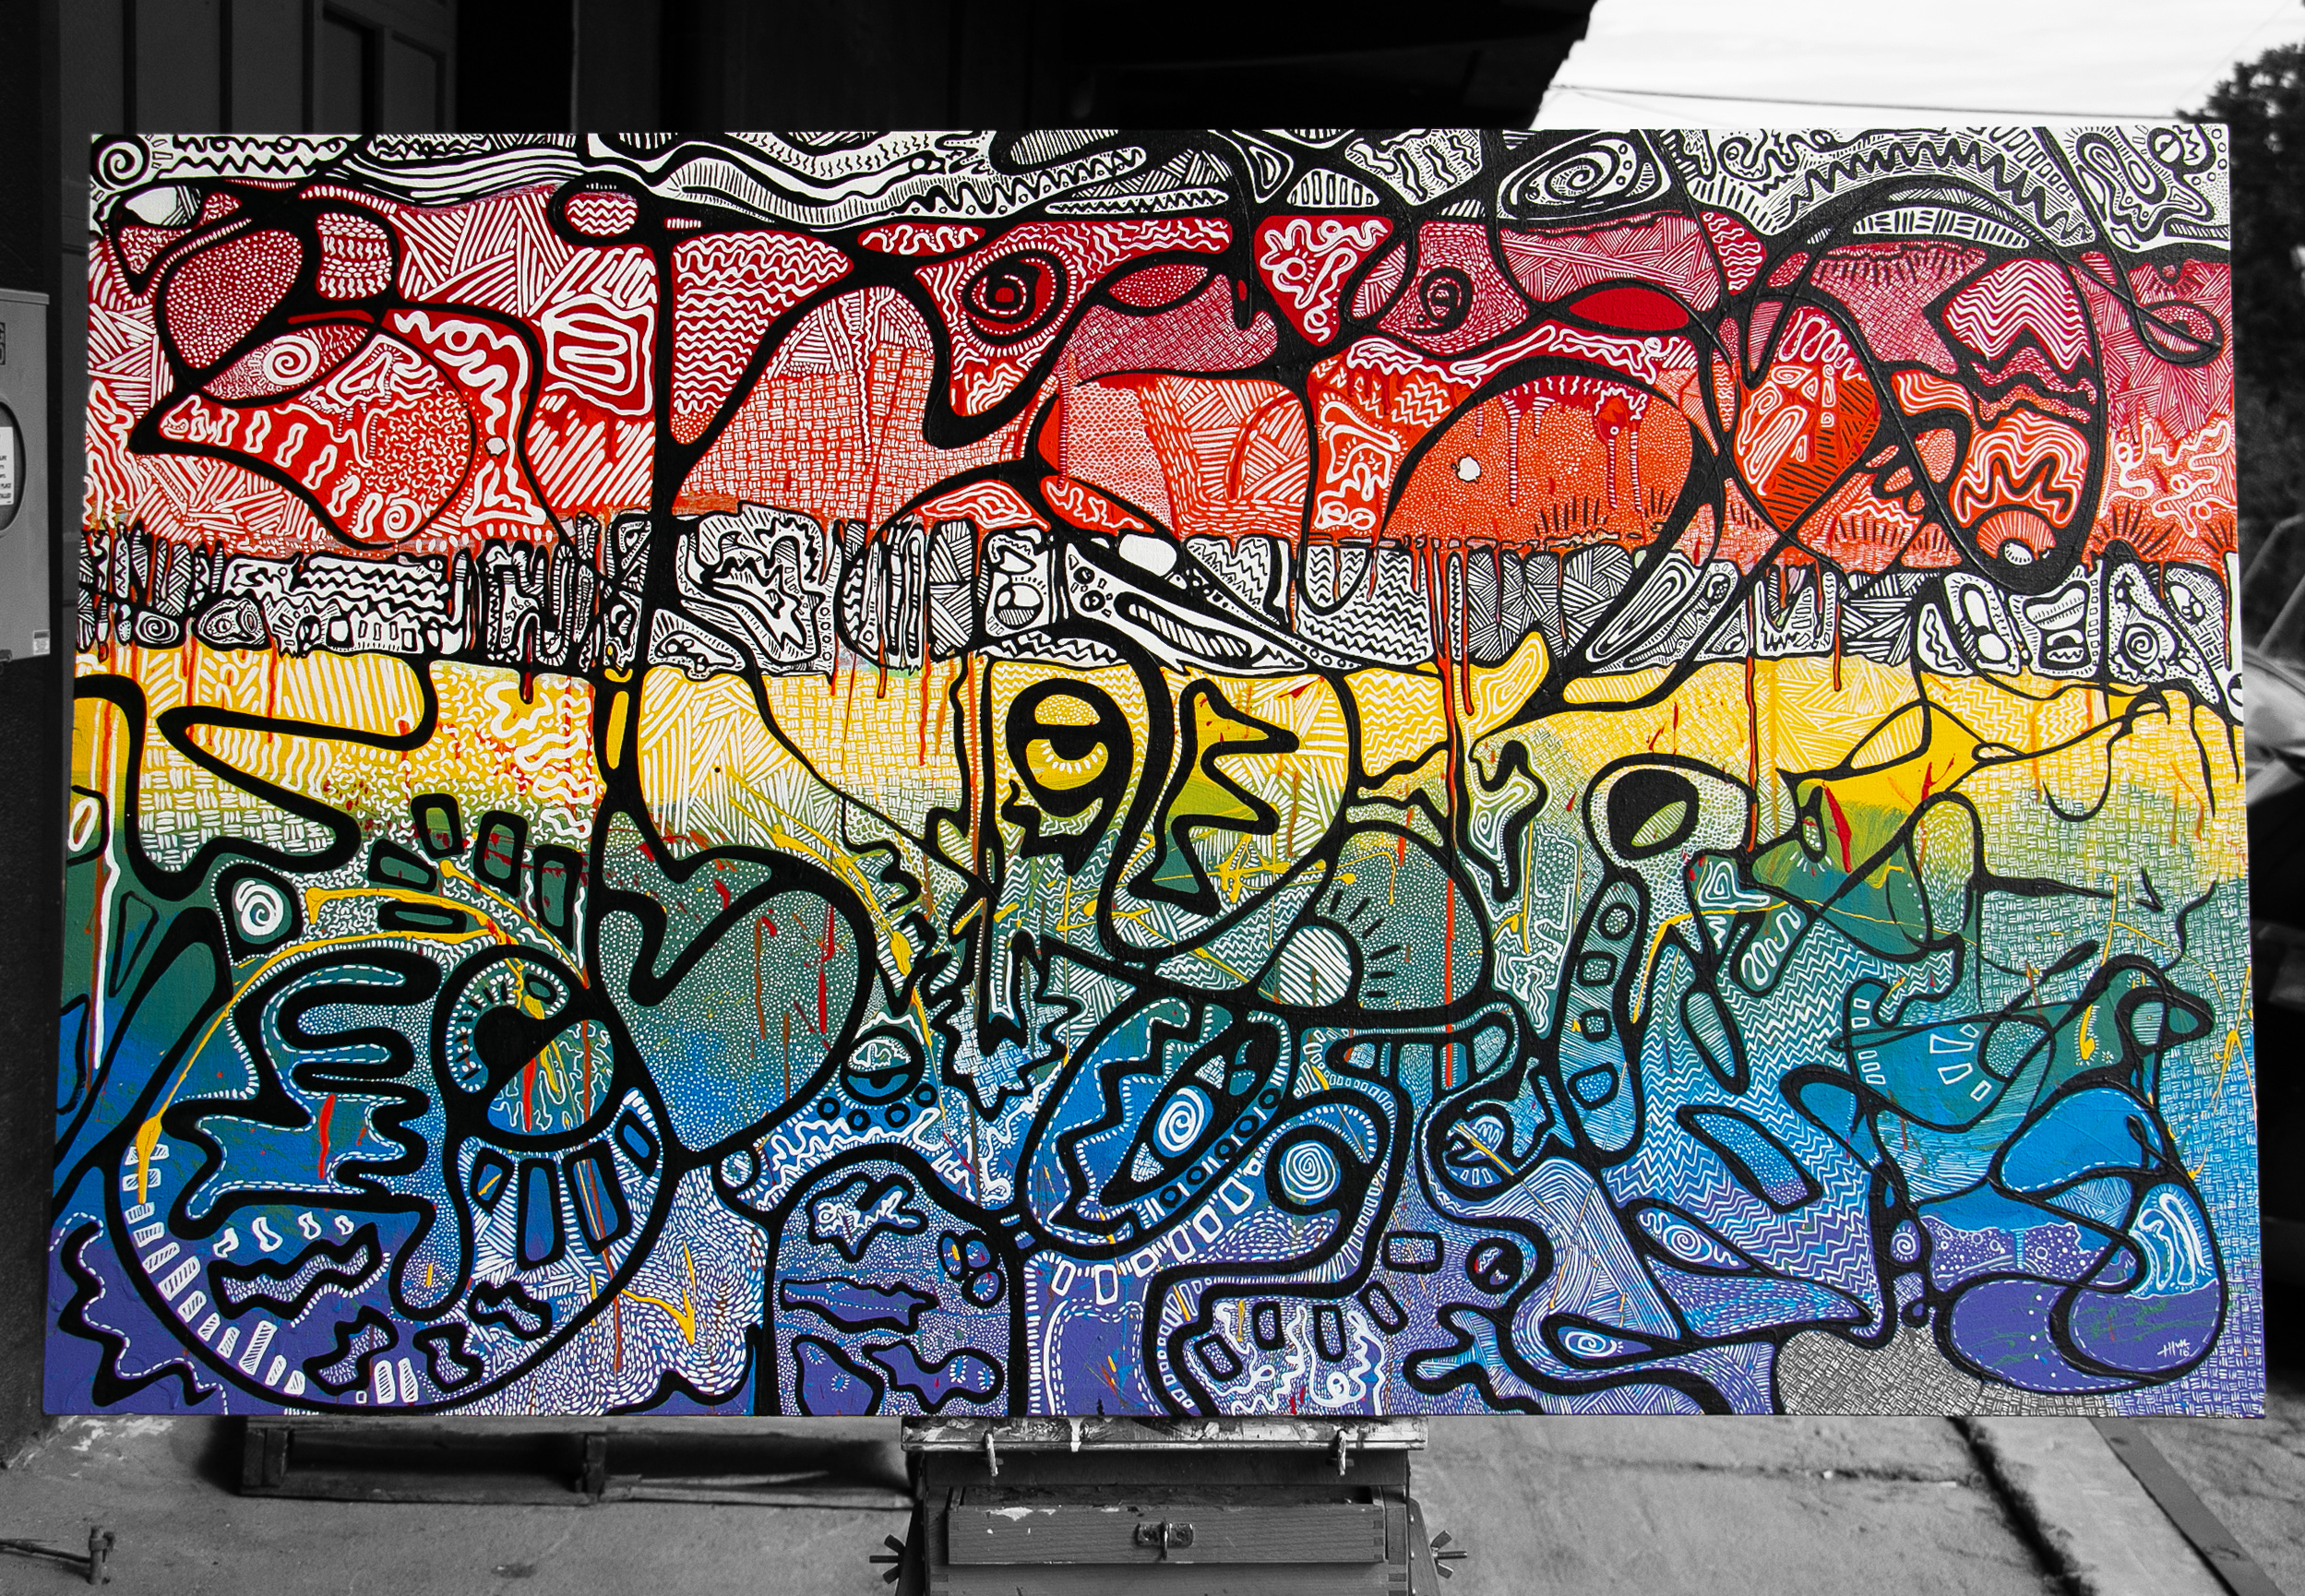 Fruity Drip - 4' x 5' - Acrylic on Canvas Color Me Tone - 2018